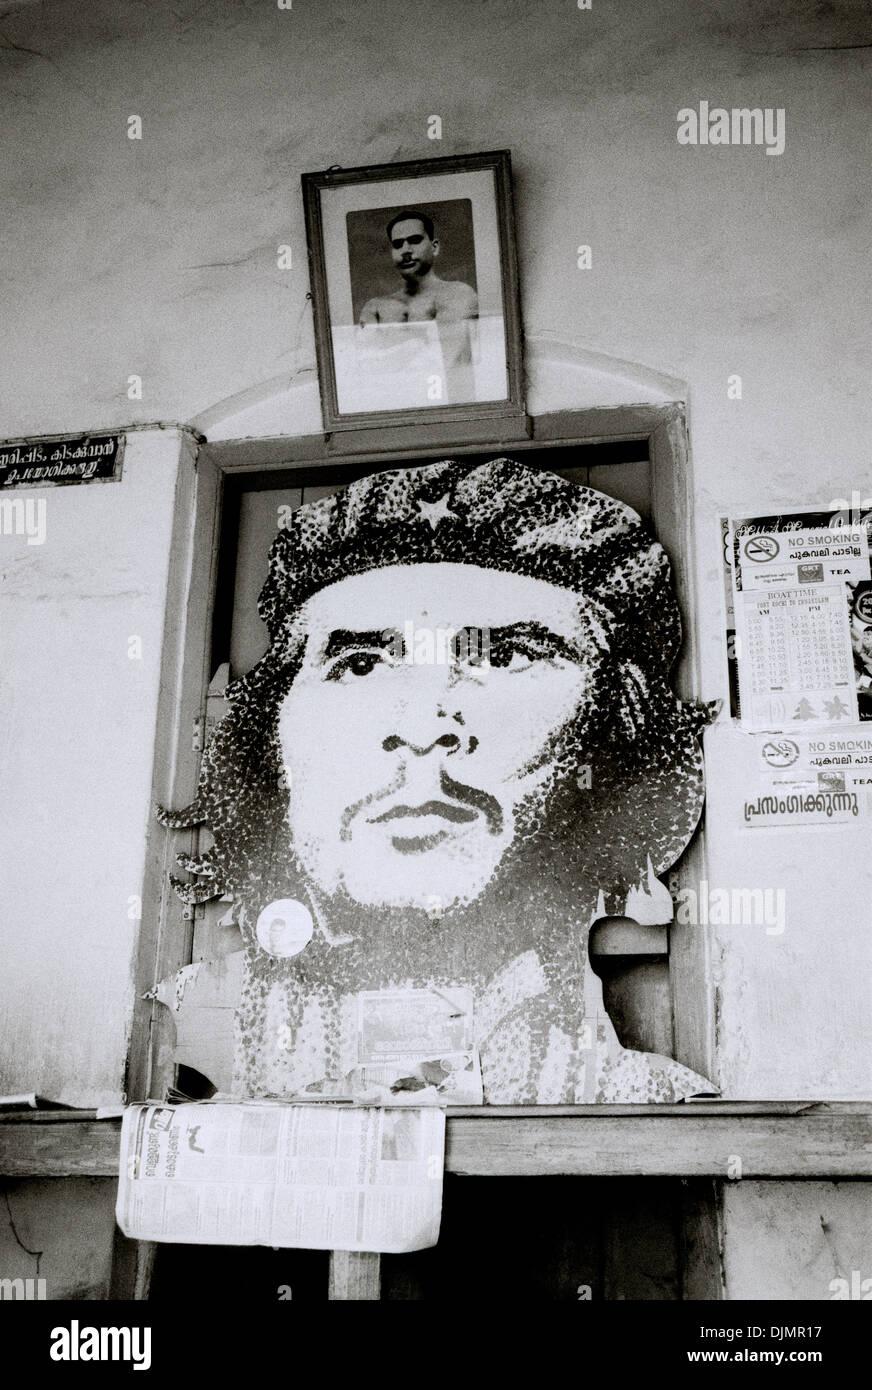 Che Guevara in the Communist reading room in Fort Kochi Cochin in Kerala in South India in Asia. Culture Portrait Revolution Politics Political Travel - Stock Image